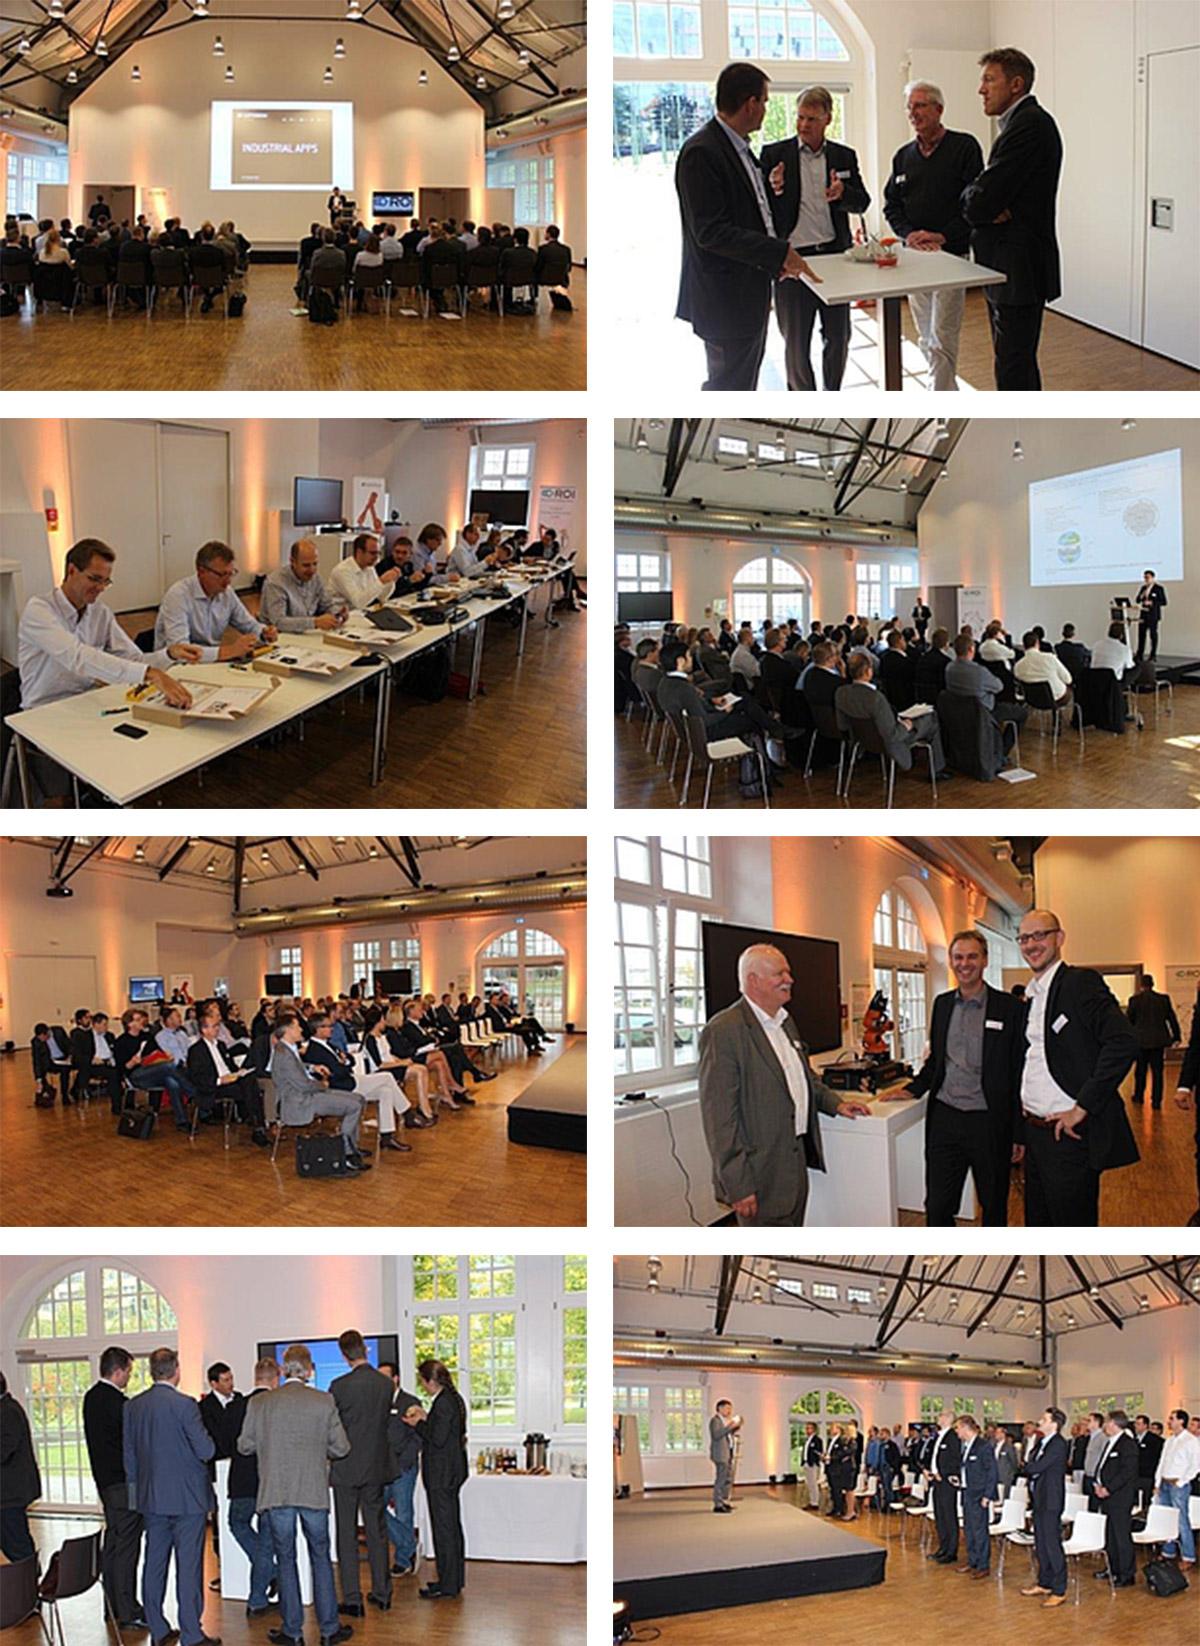 Bilder des Workshops ROI Industrie 4.0 Konkret